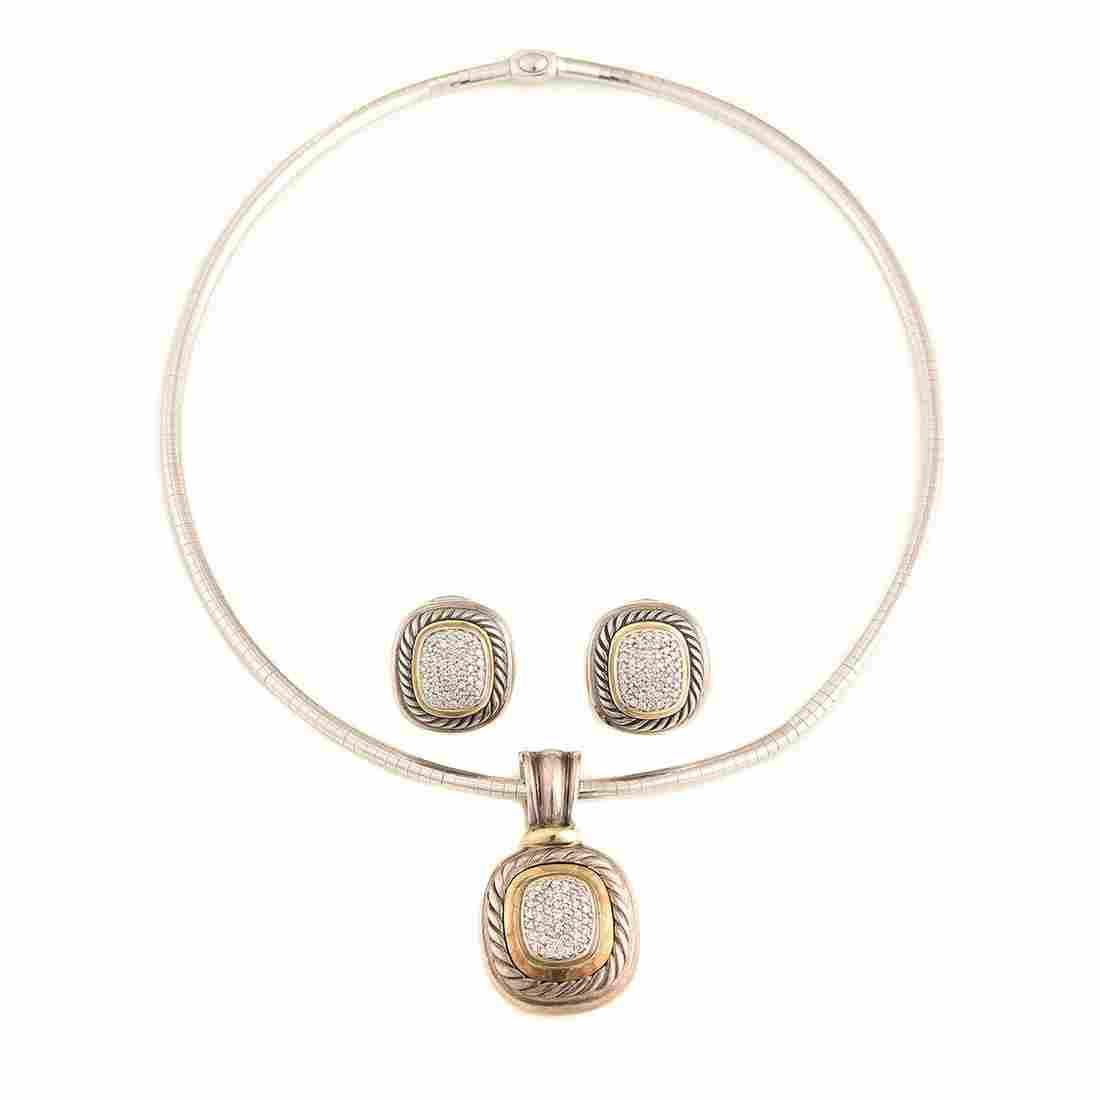 David Yurman Diamond, Sterling Silver, 14k Gold Jewelry